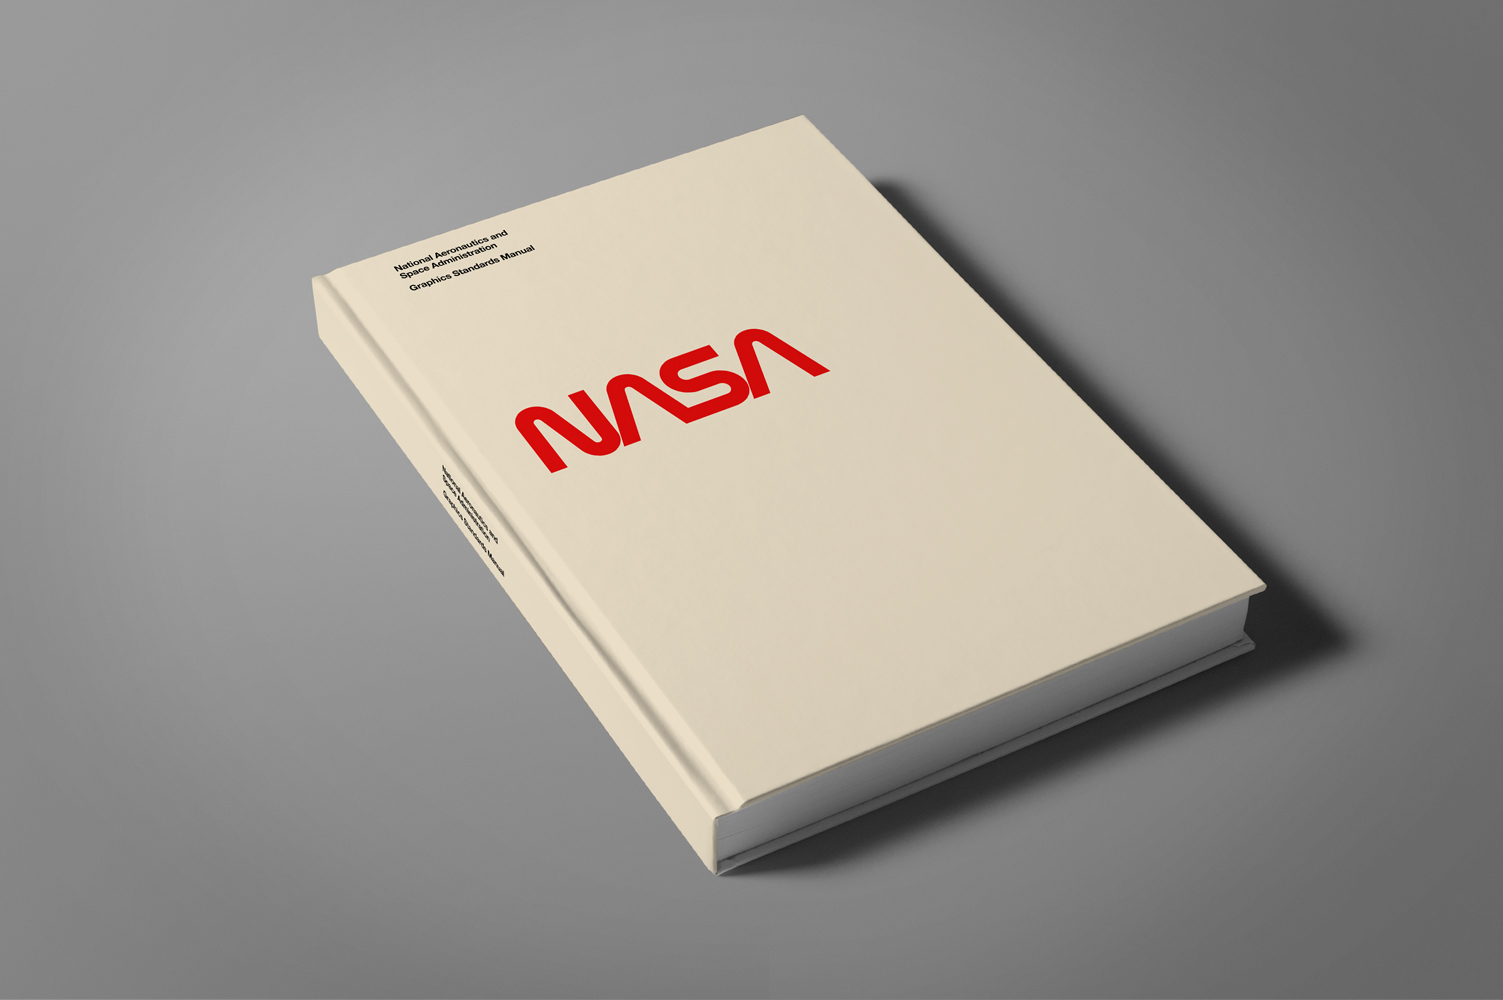 NASA's 1970s Graphics Standards Manual